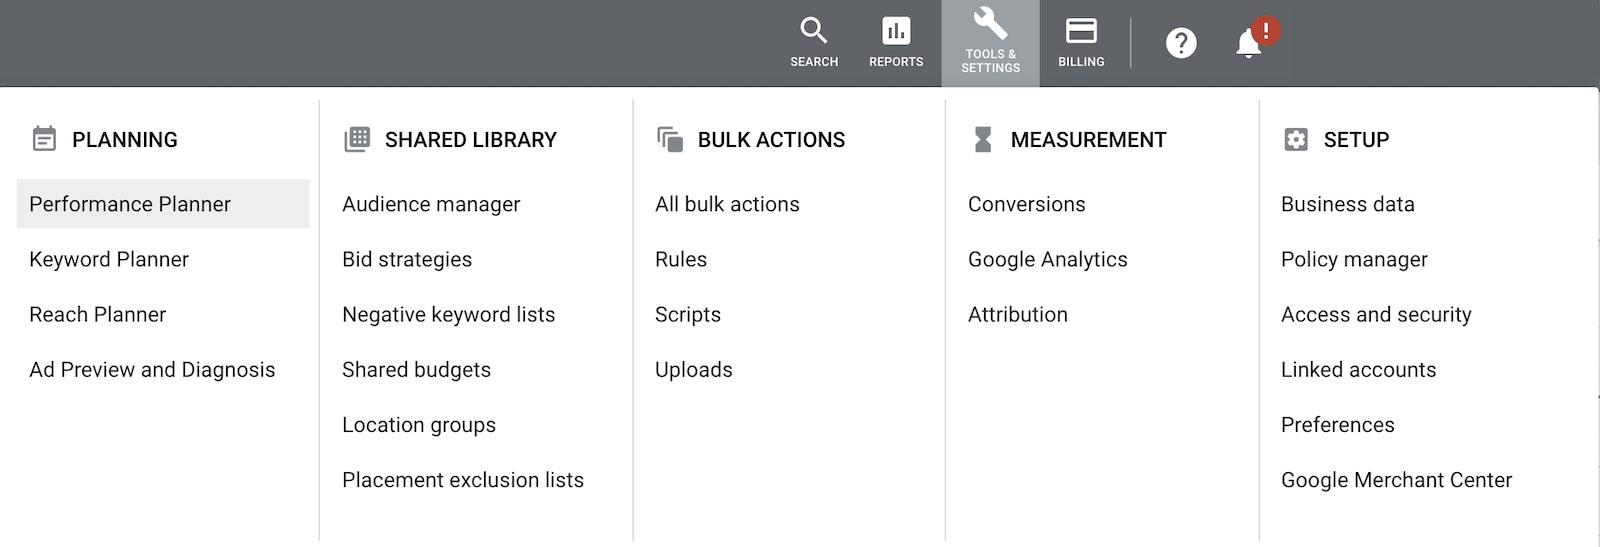 Google Ads - Tools & Setting menu